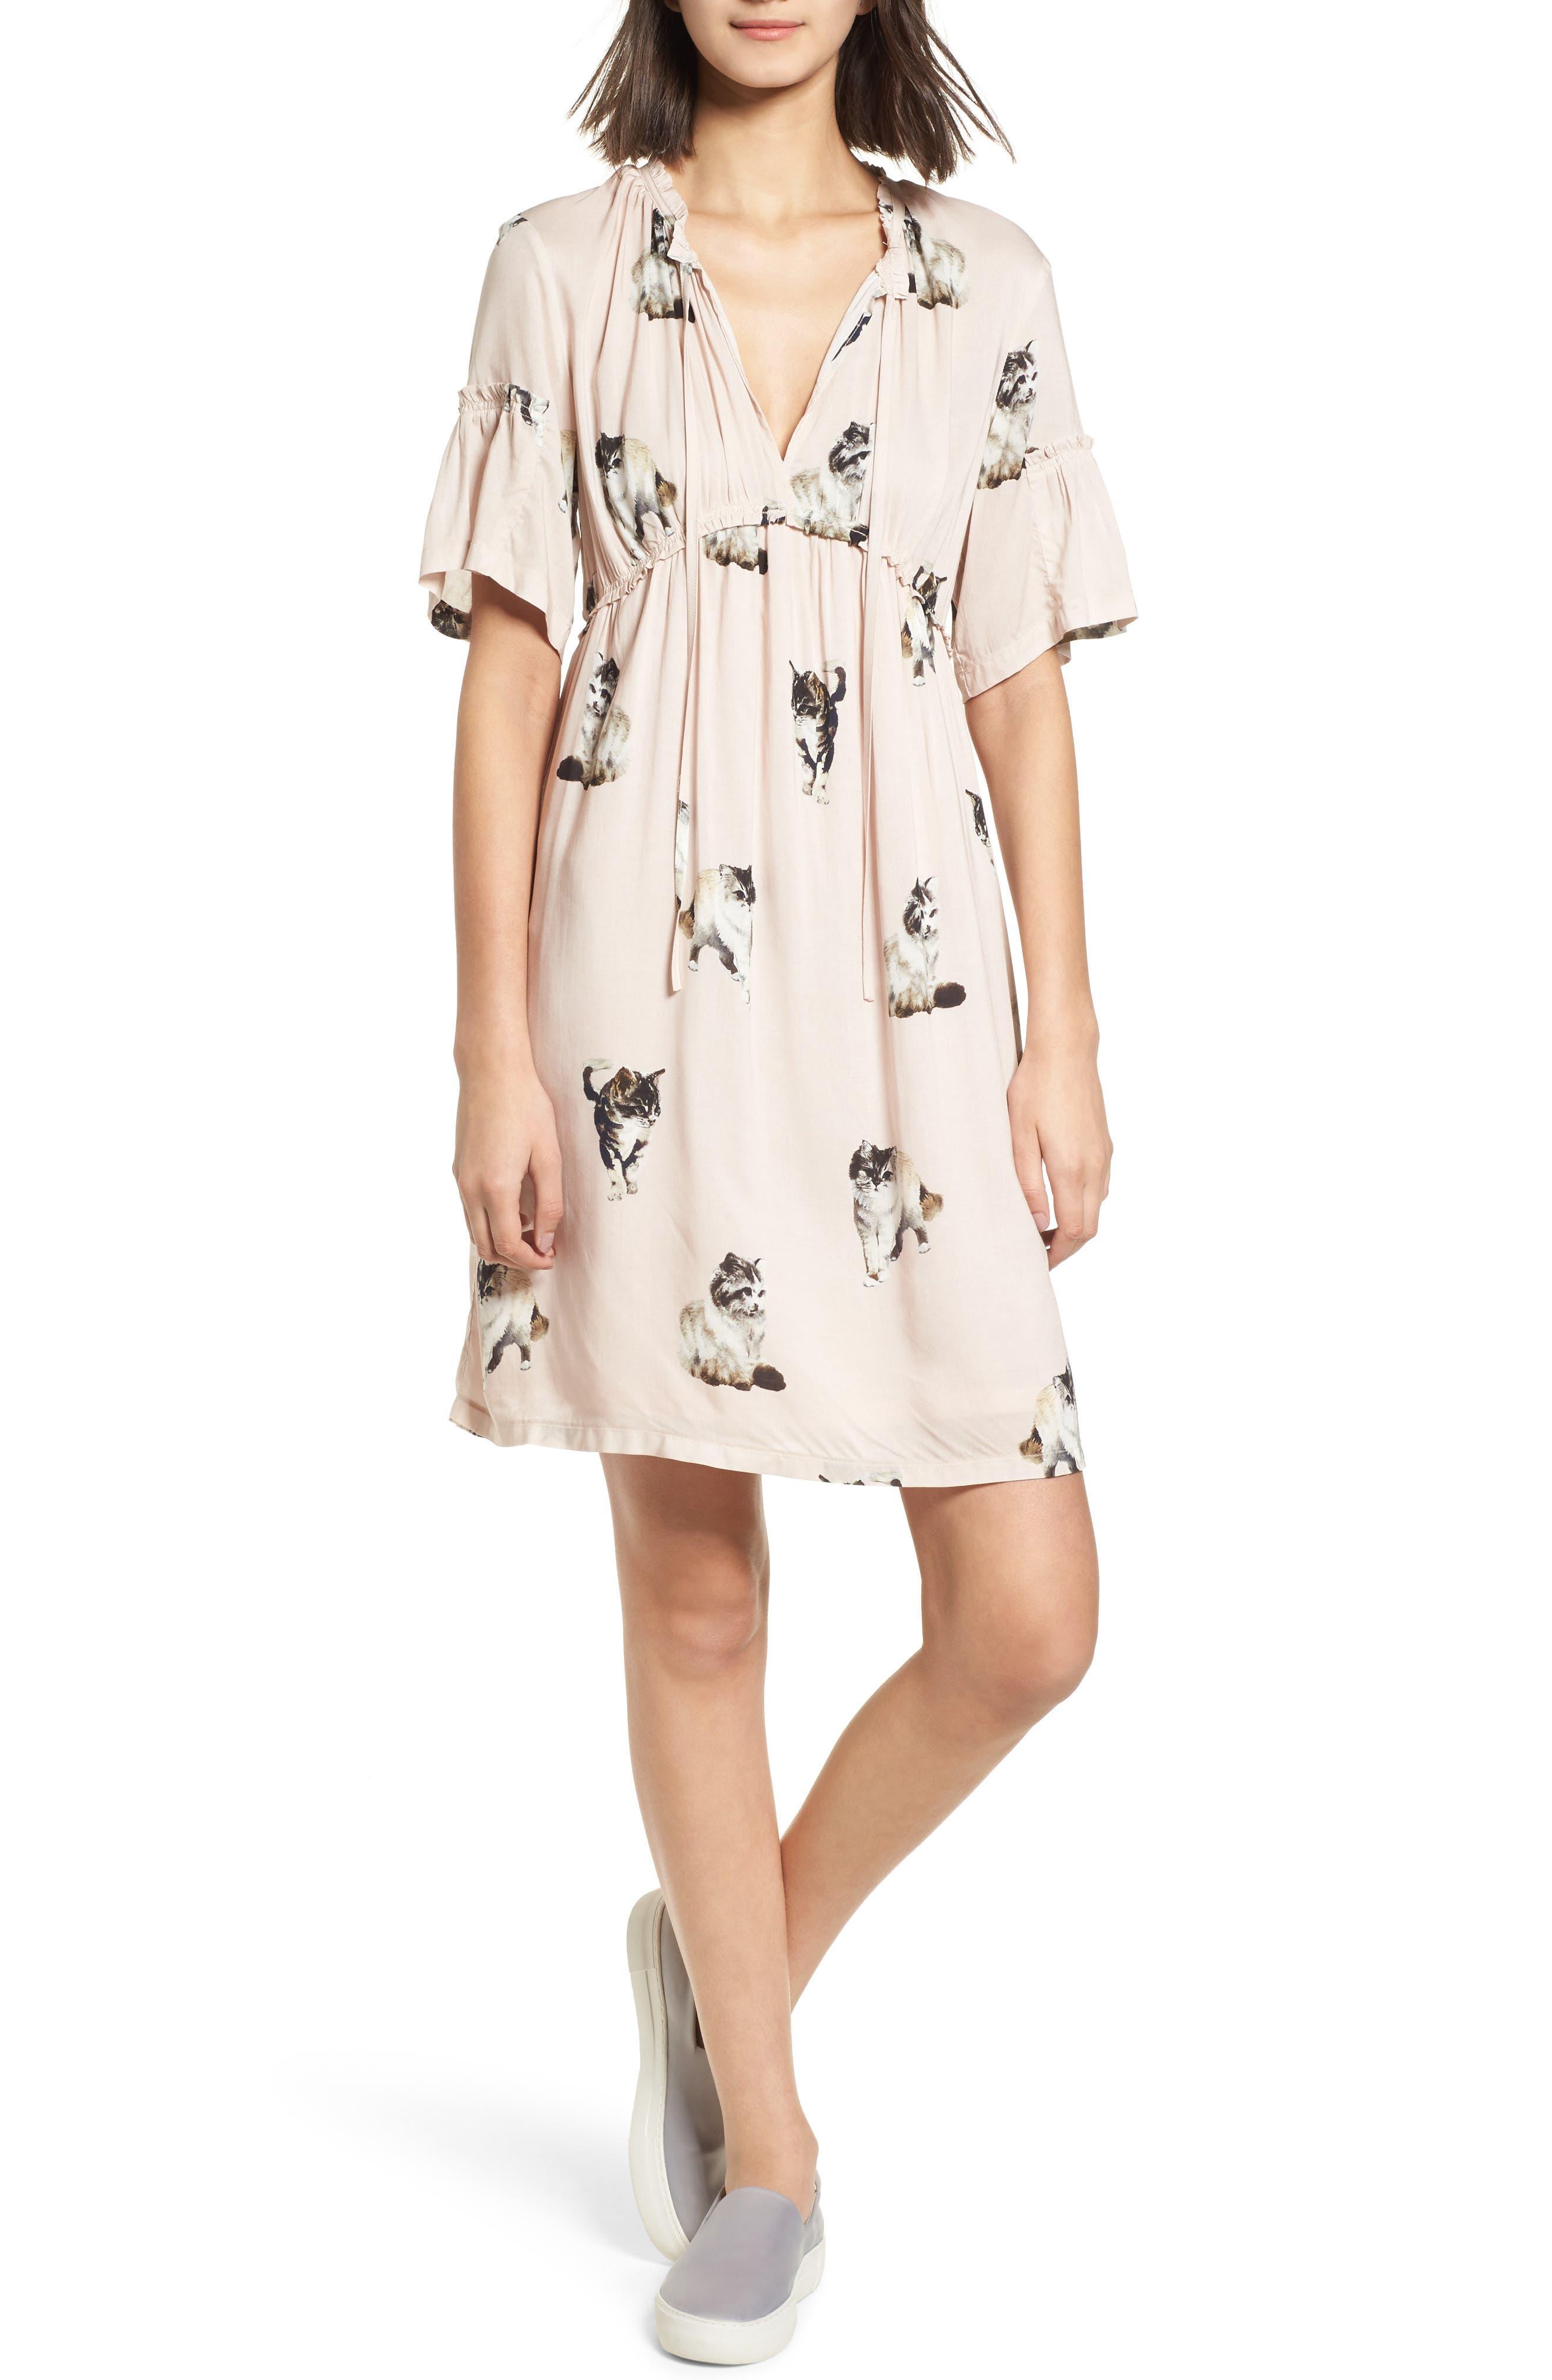 Alternate Image 1 Selected - Paul & Joe Sister Fanfan Dress